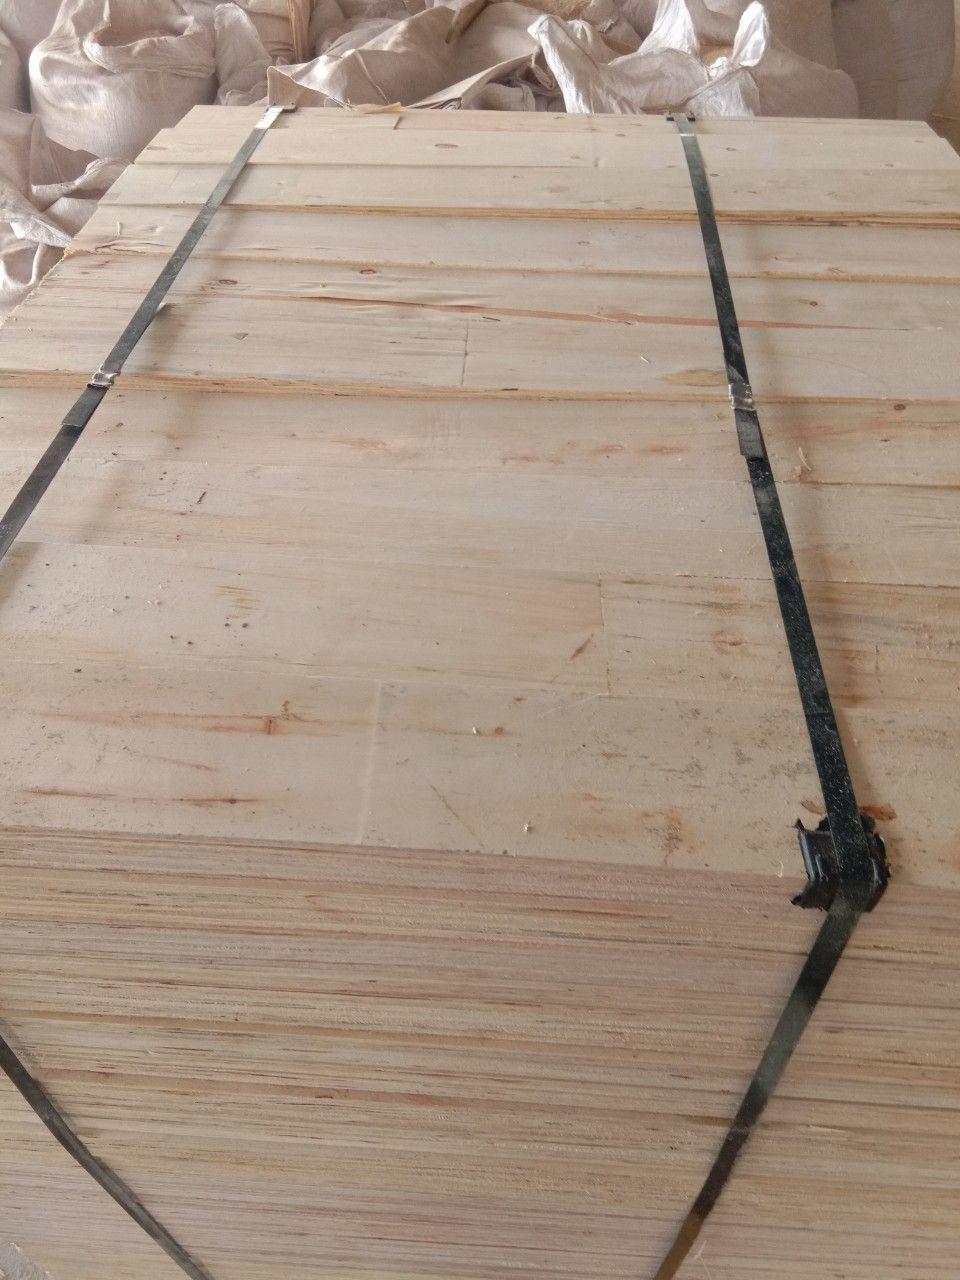 LVL (Laminated Veneer Lumber) from Vietnam